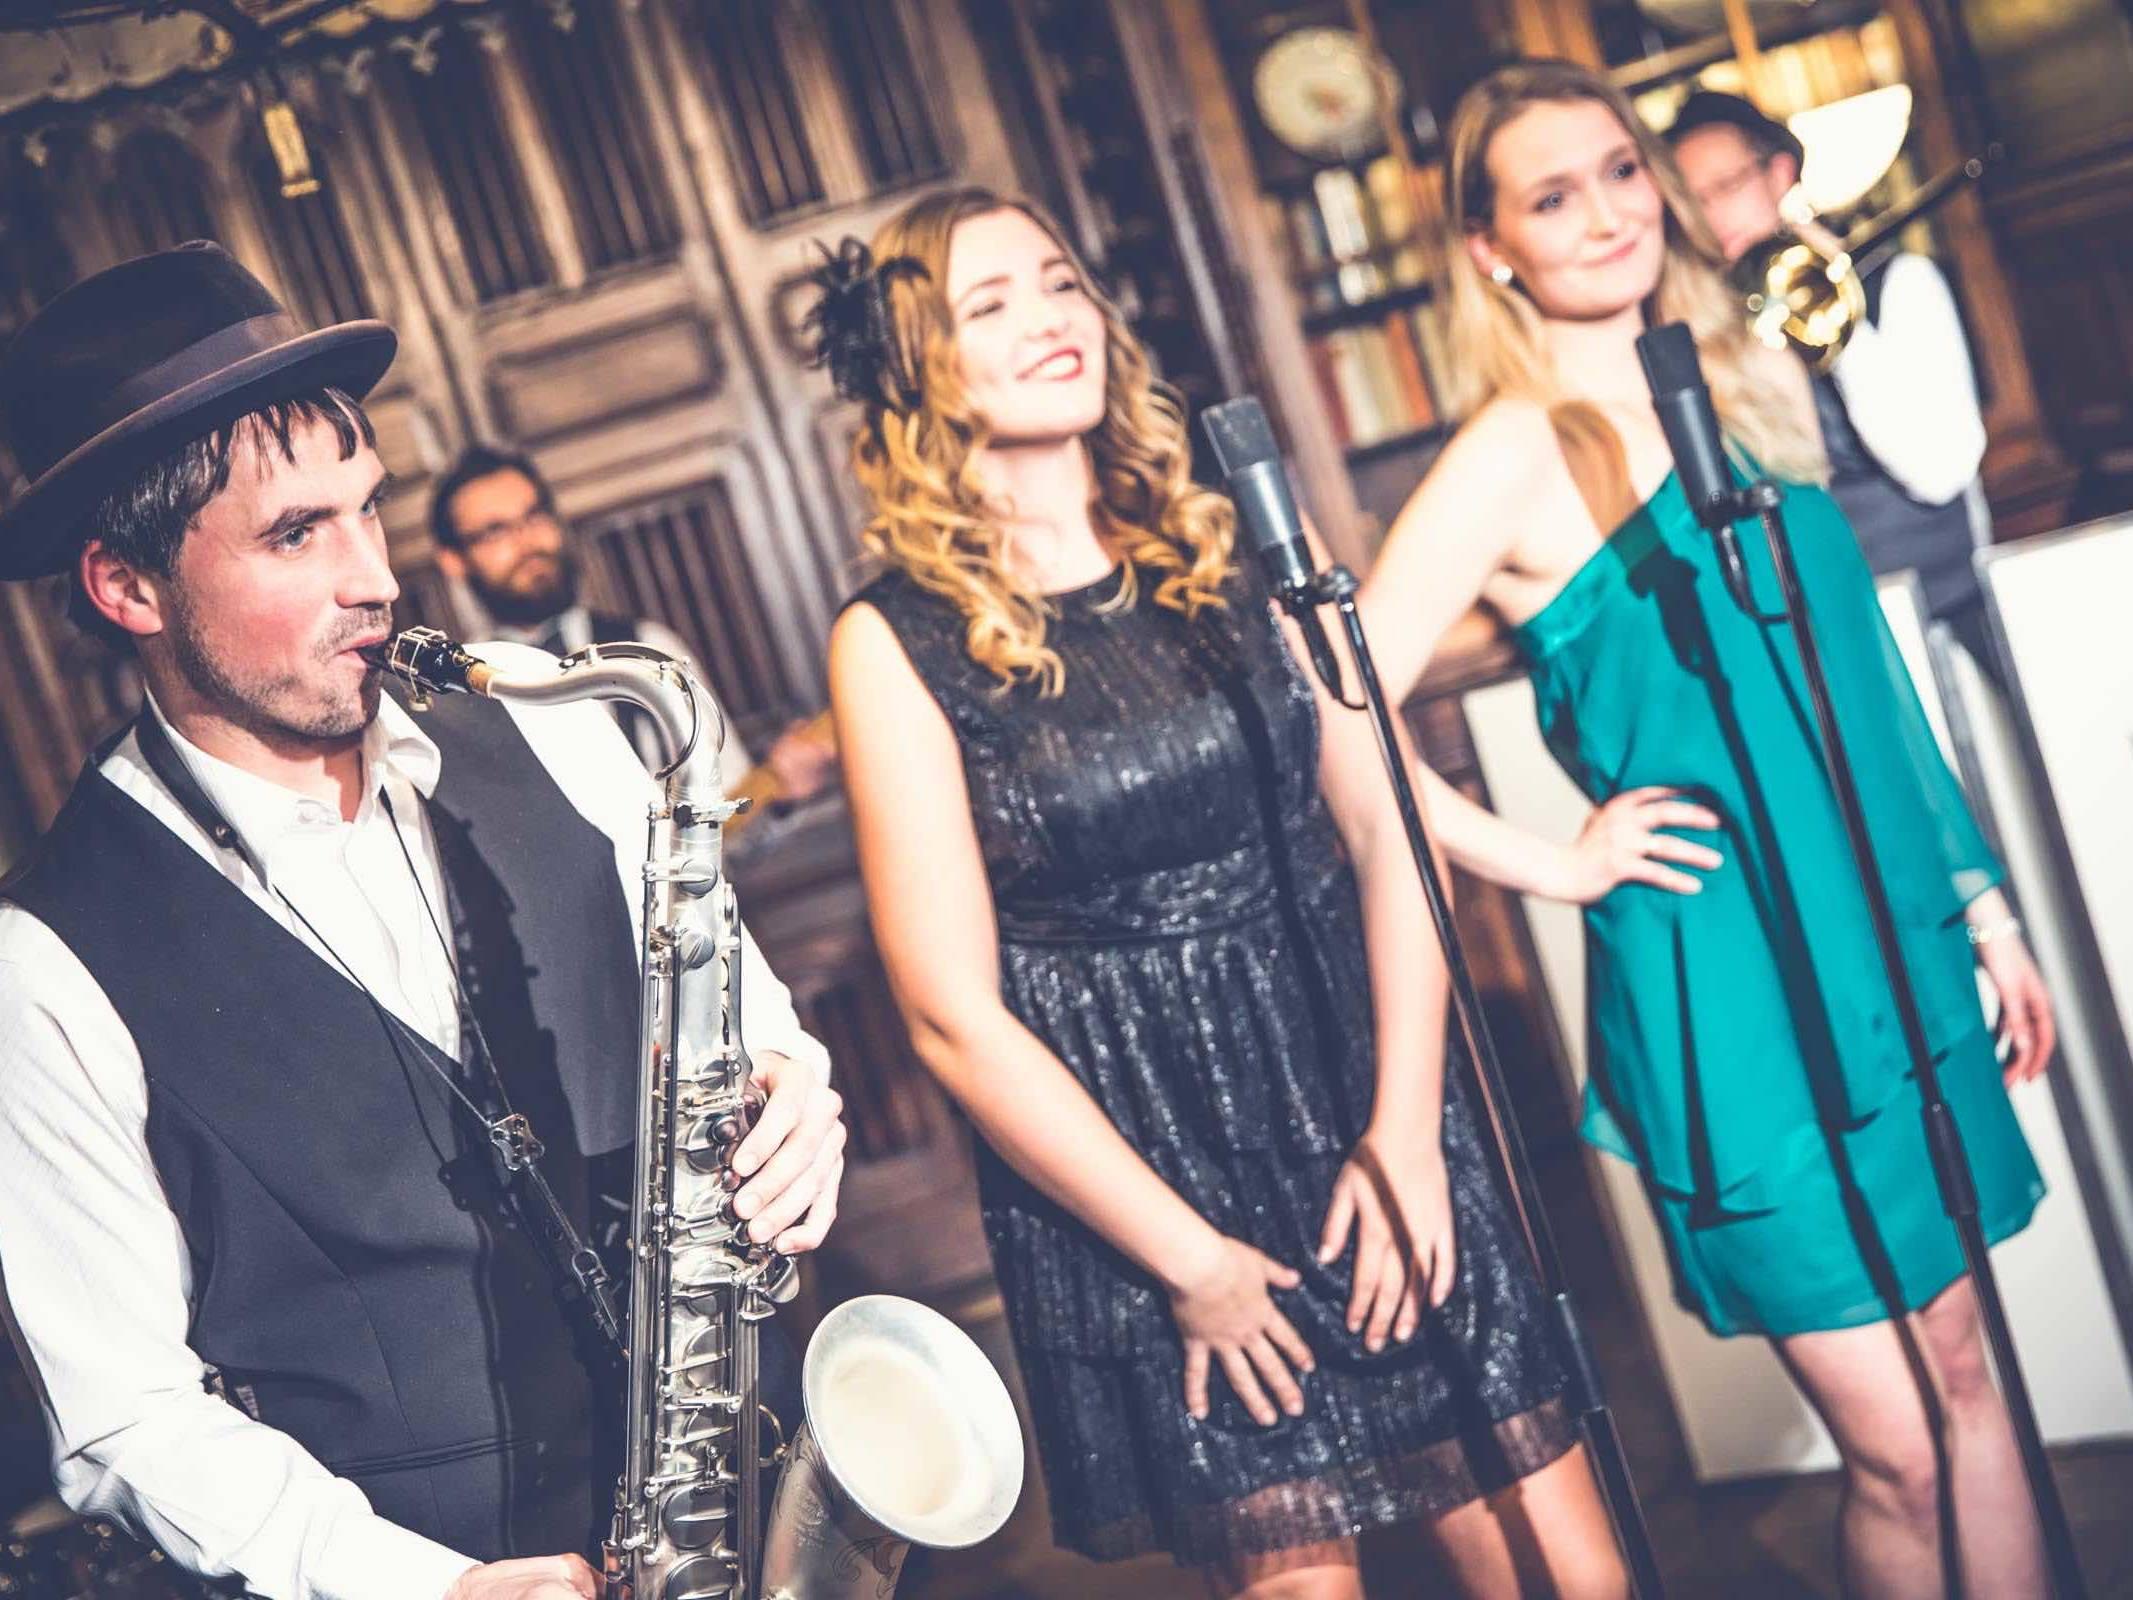 Band   Hamburg   Liveband   Livemusik   Walking   Act   Partyband   Jazzband   Swingband   Loungeband   Popband   Jazz   Saxophonist   Sängerin   Hochzeit   Messe   Firmenfeier   Charity   Gala   Buchen   Mieten   Hamburgfeiert